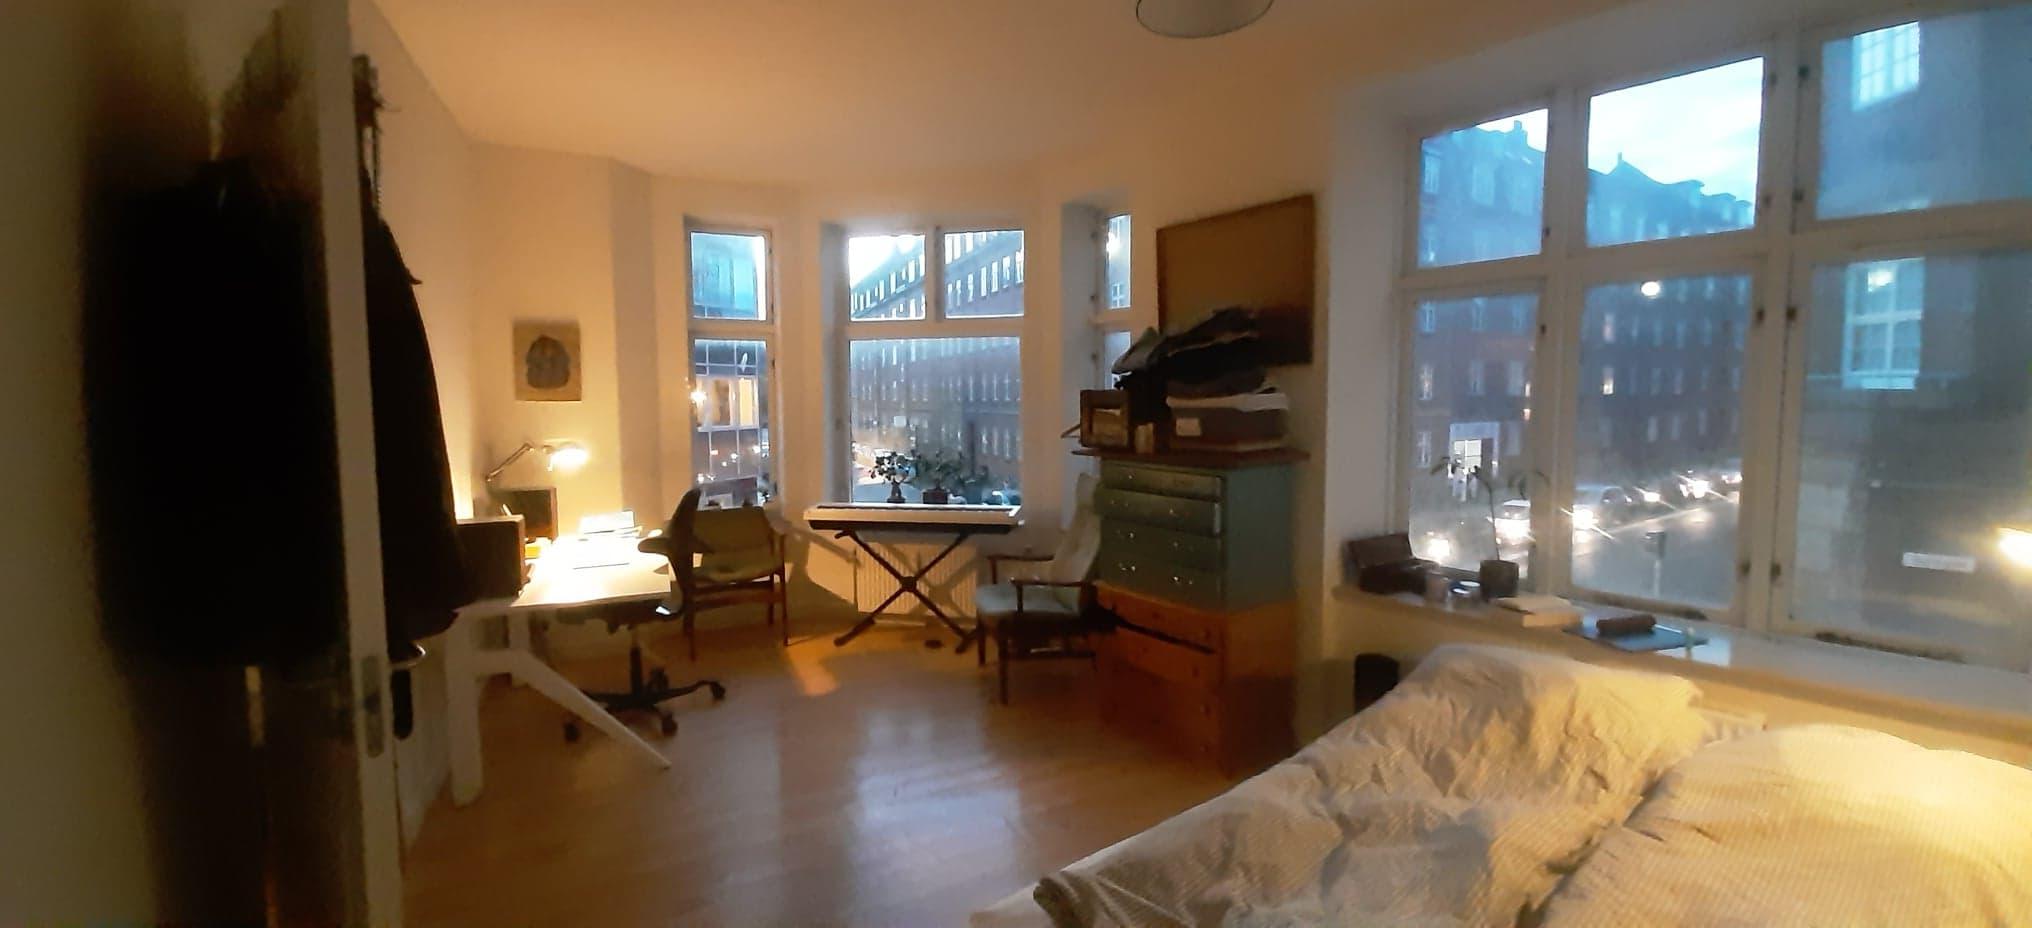 Stort lyst værelse midt i Aarhus C